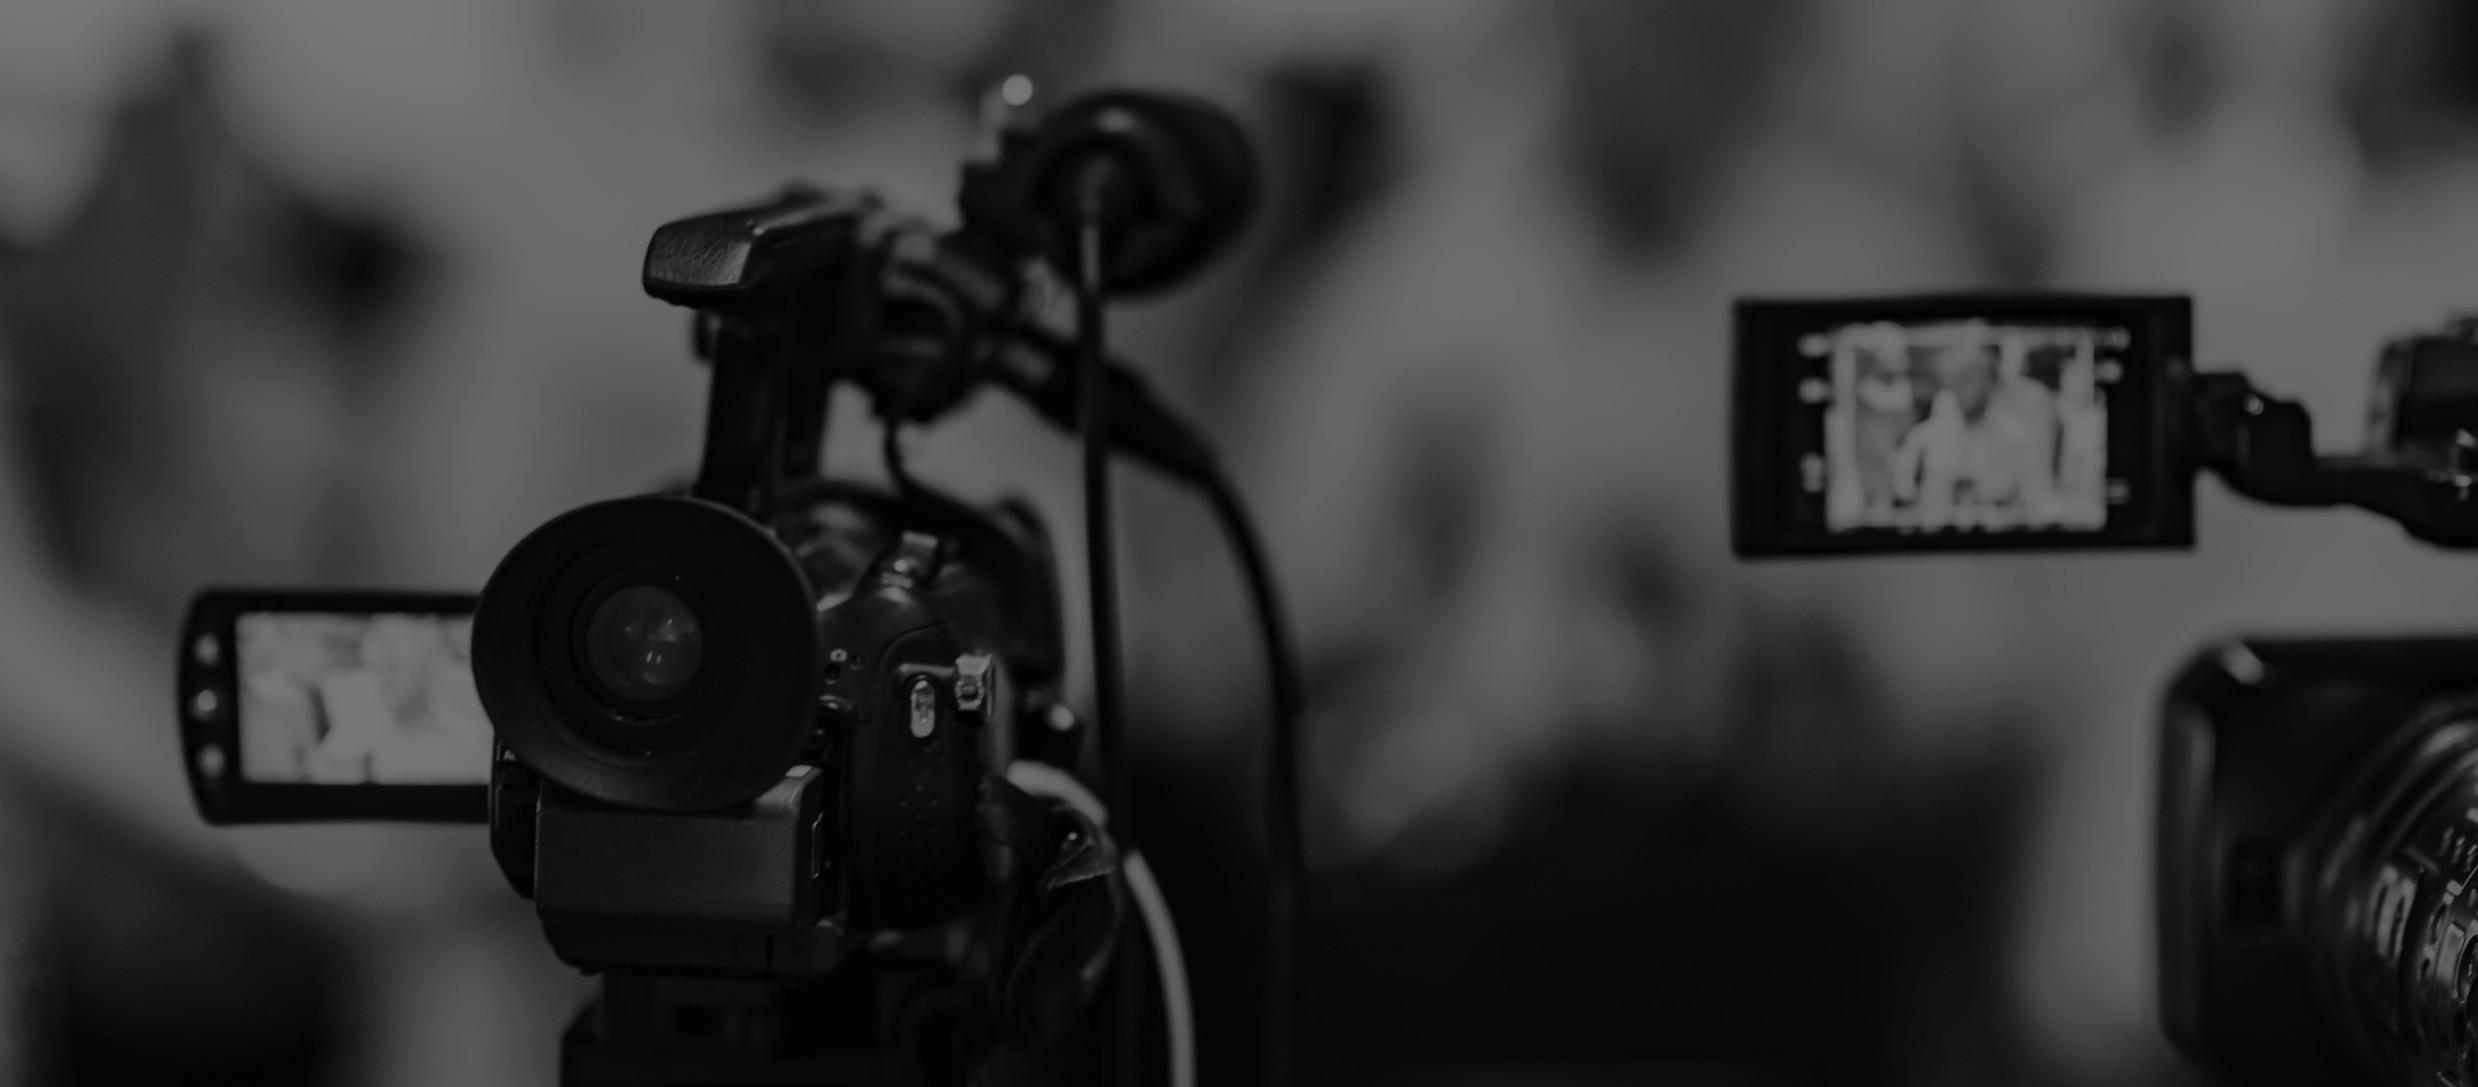 camera-at-media-conference-PCMUVRT_edite